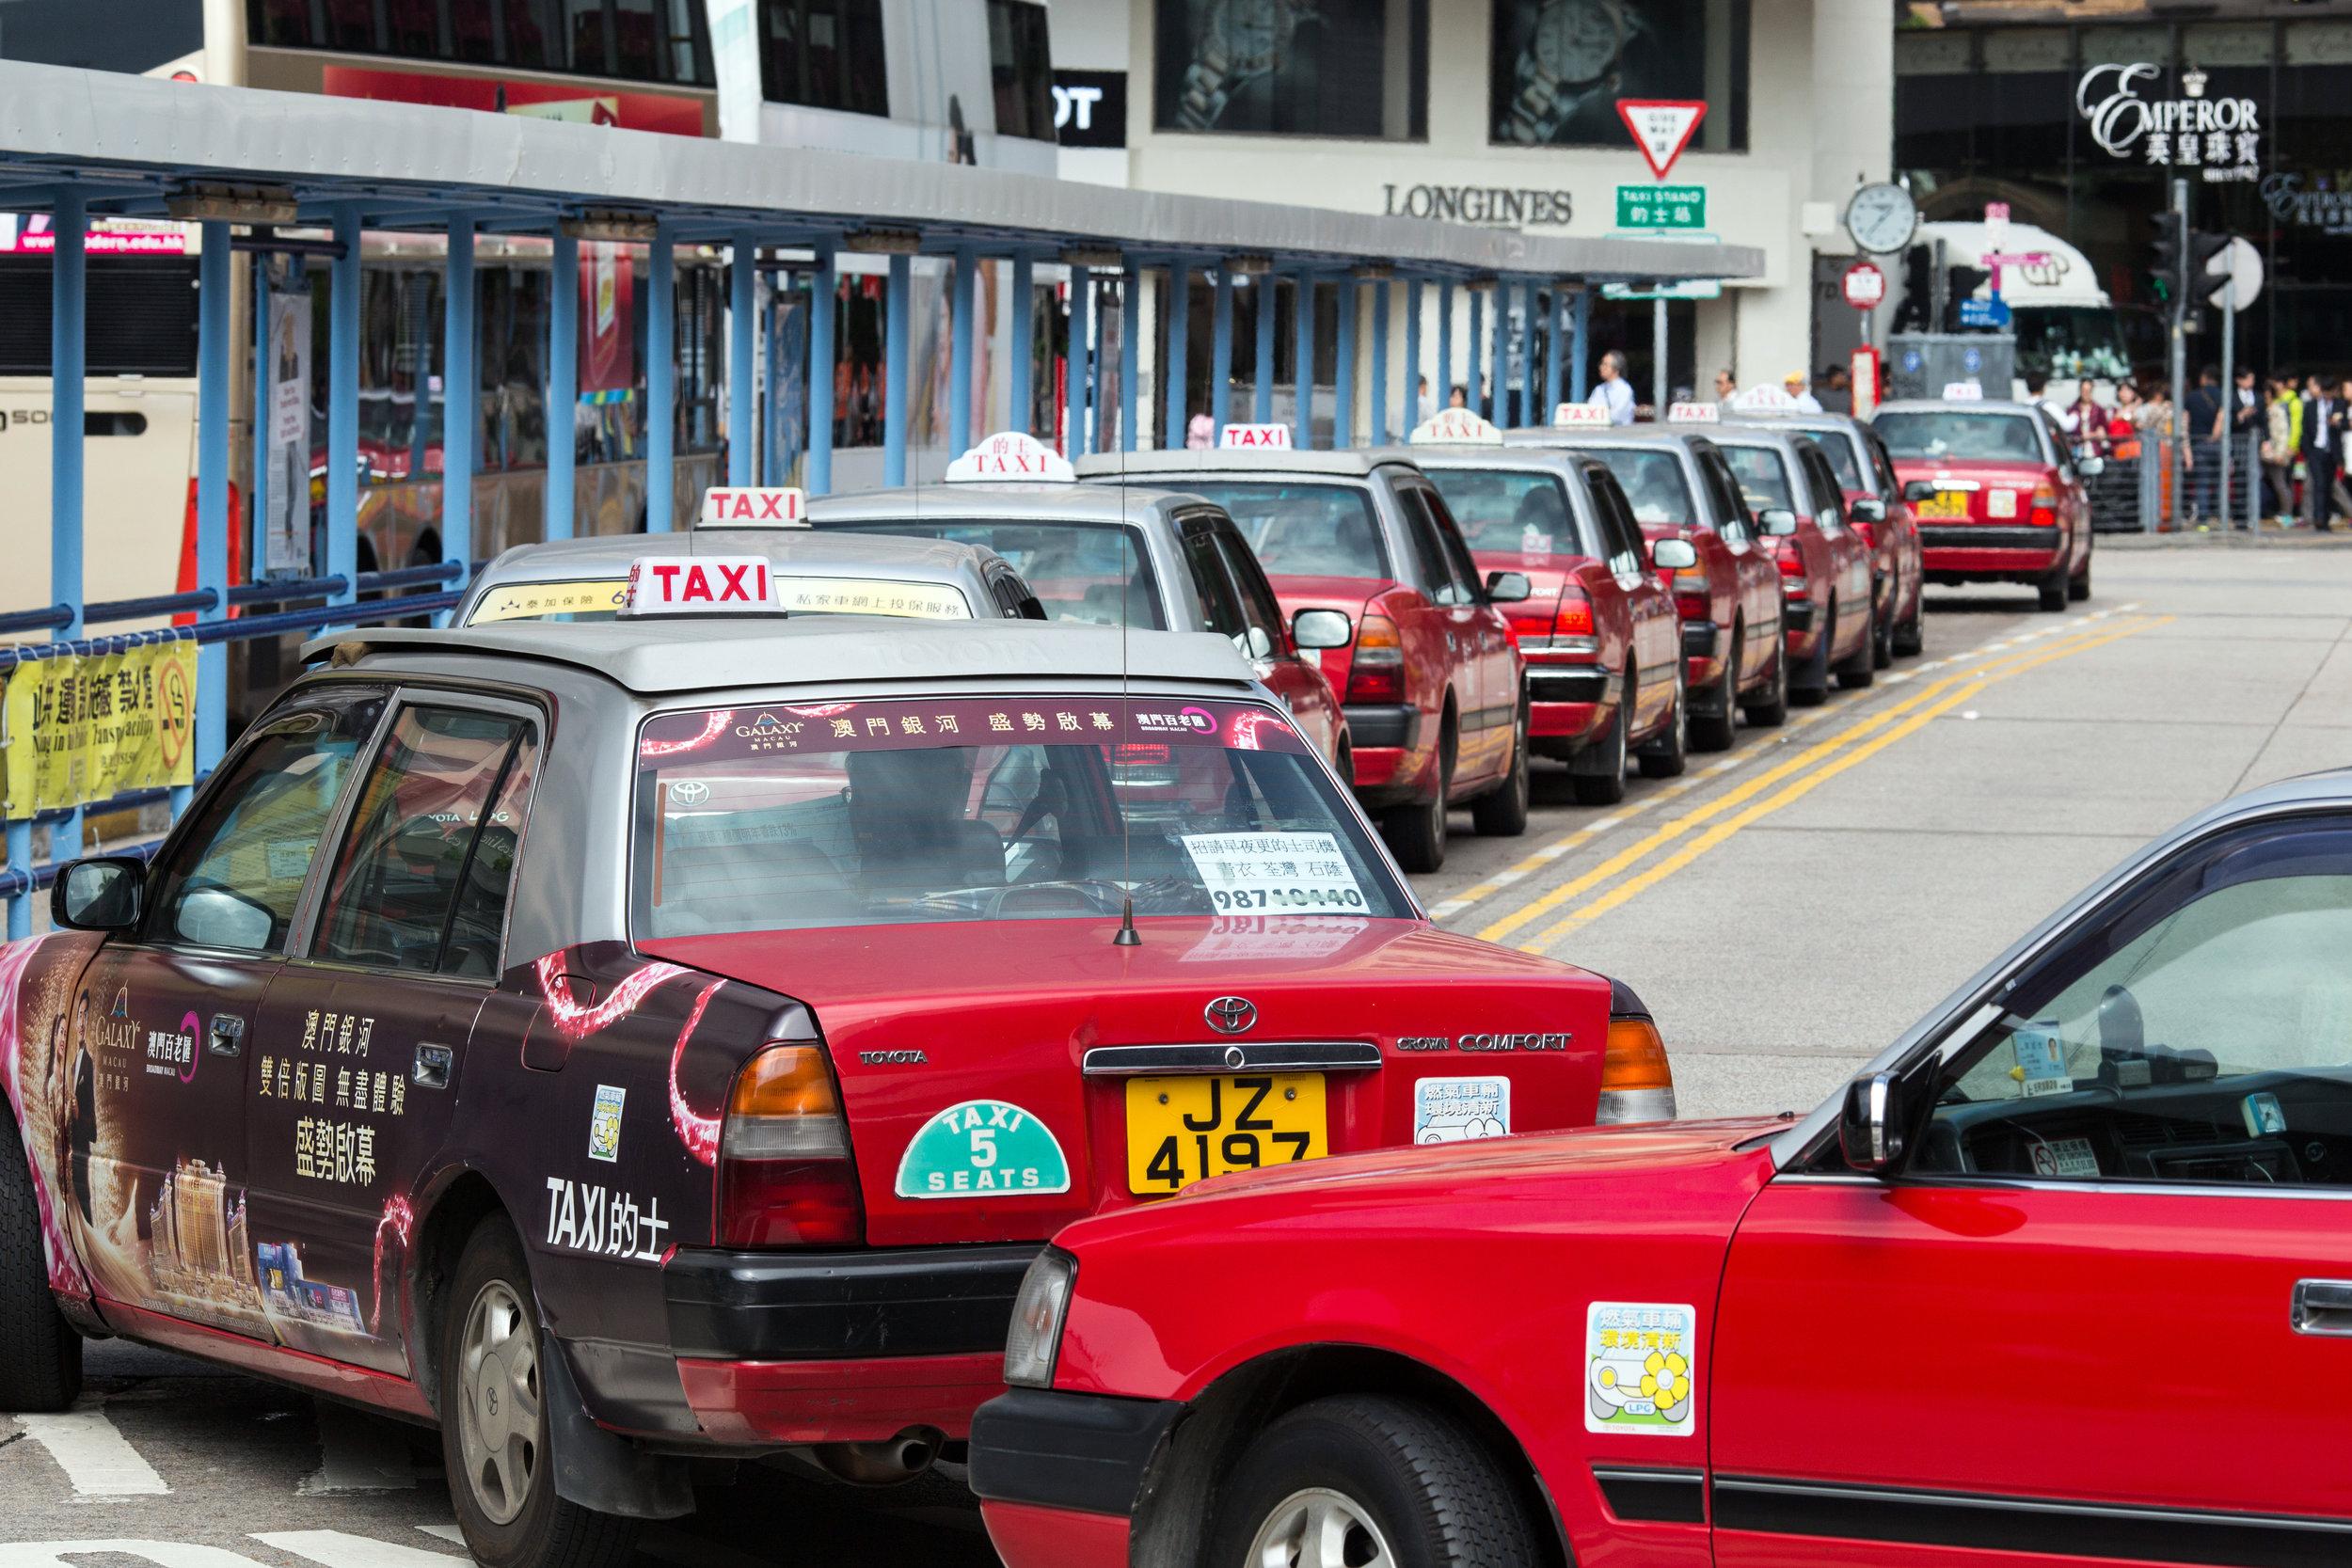 Taxis in Kowloon, Hong Kong